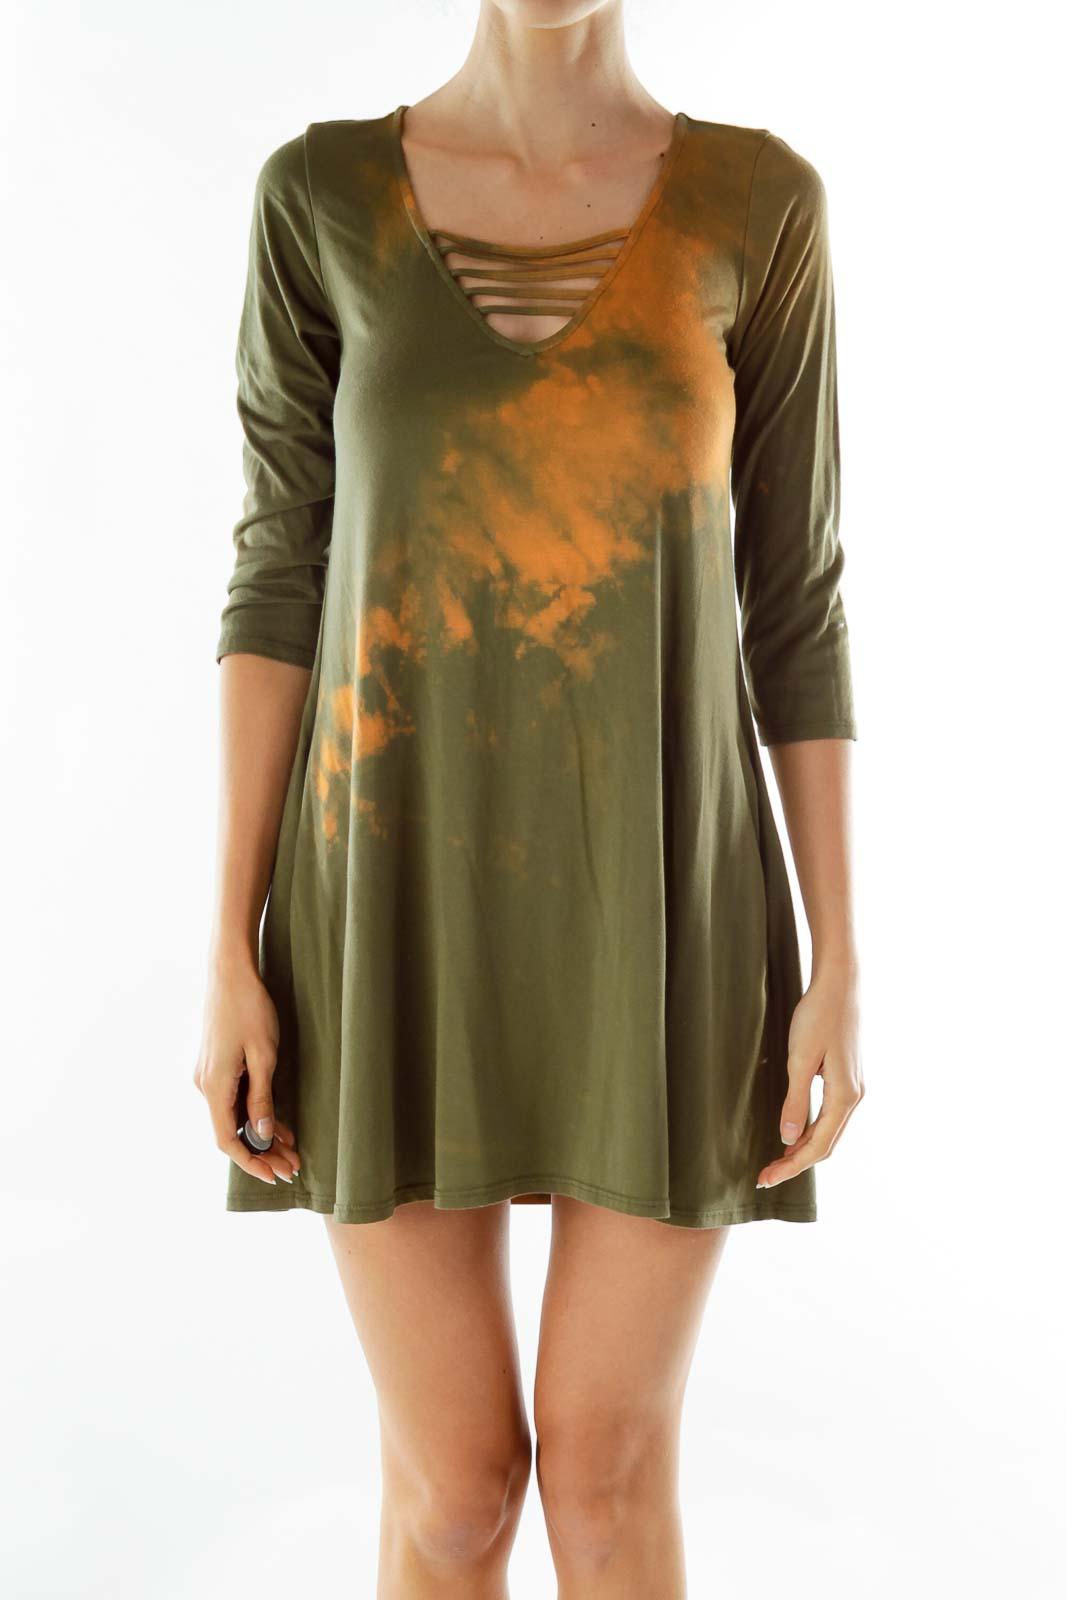 Green V-neck Tie Dye Day Dress Front